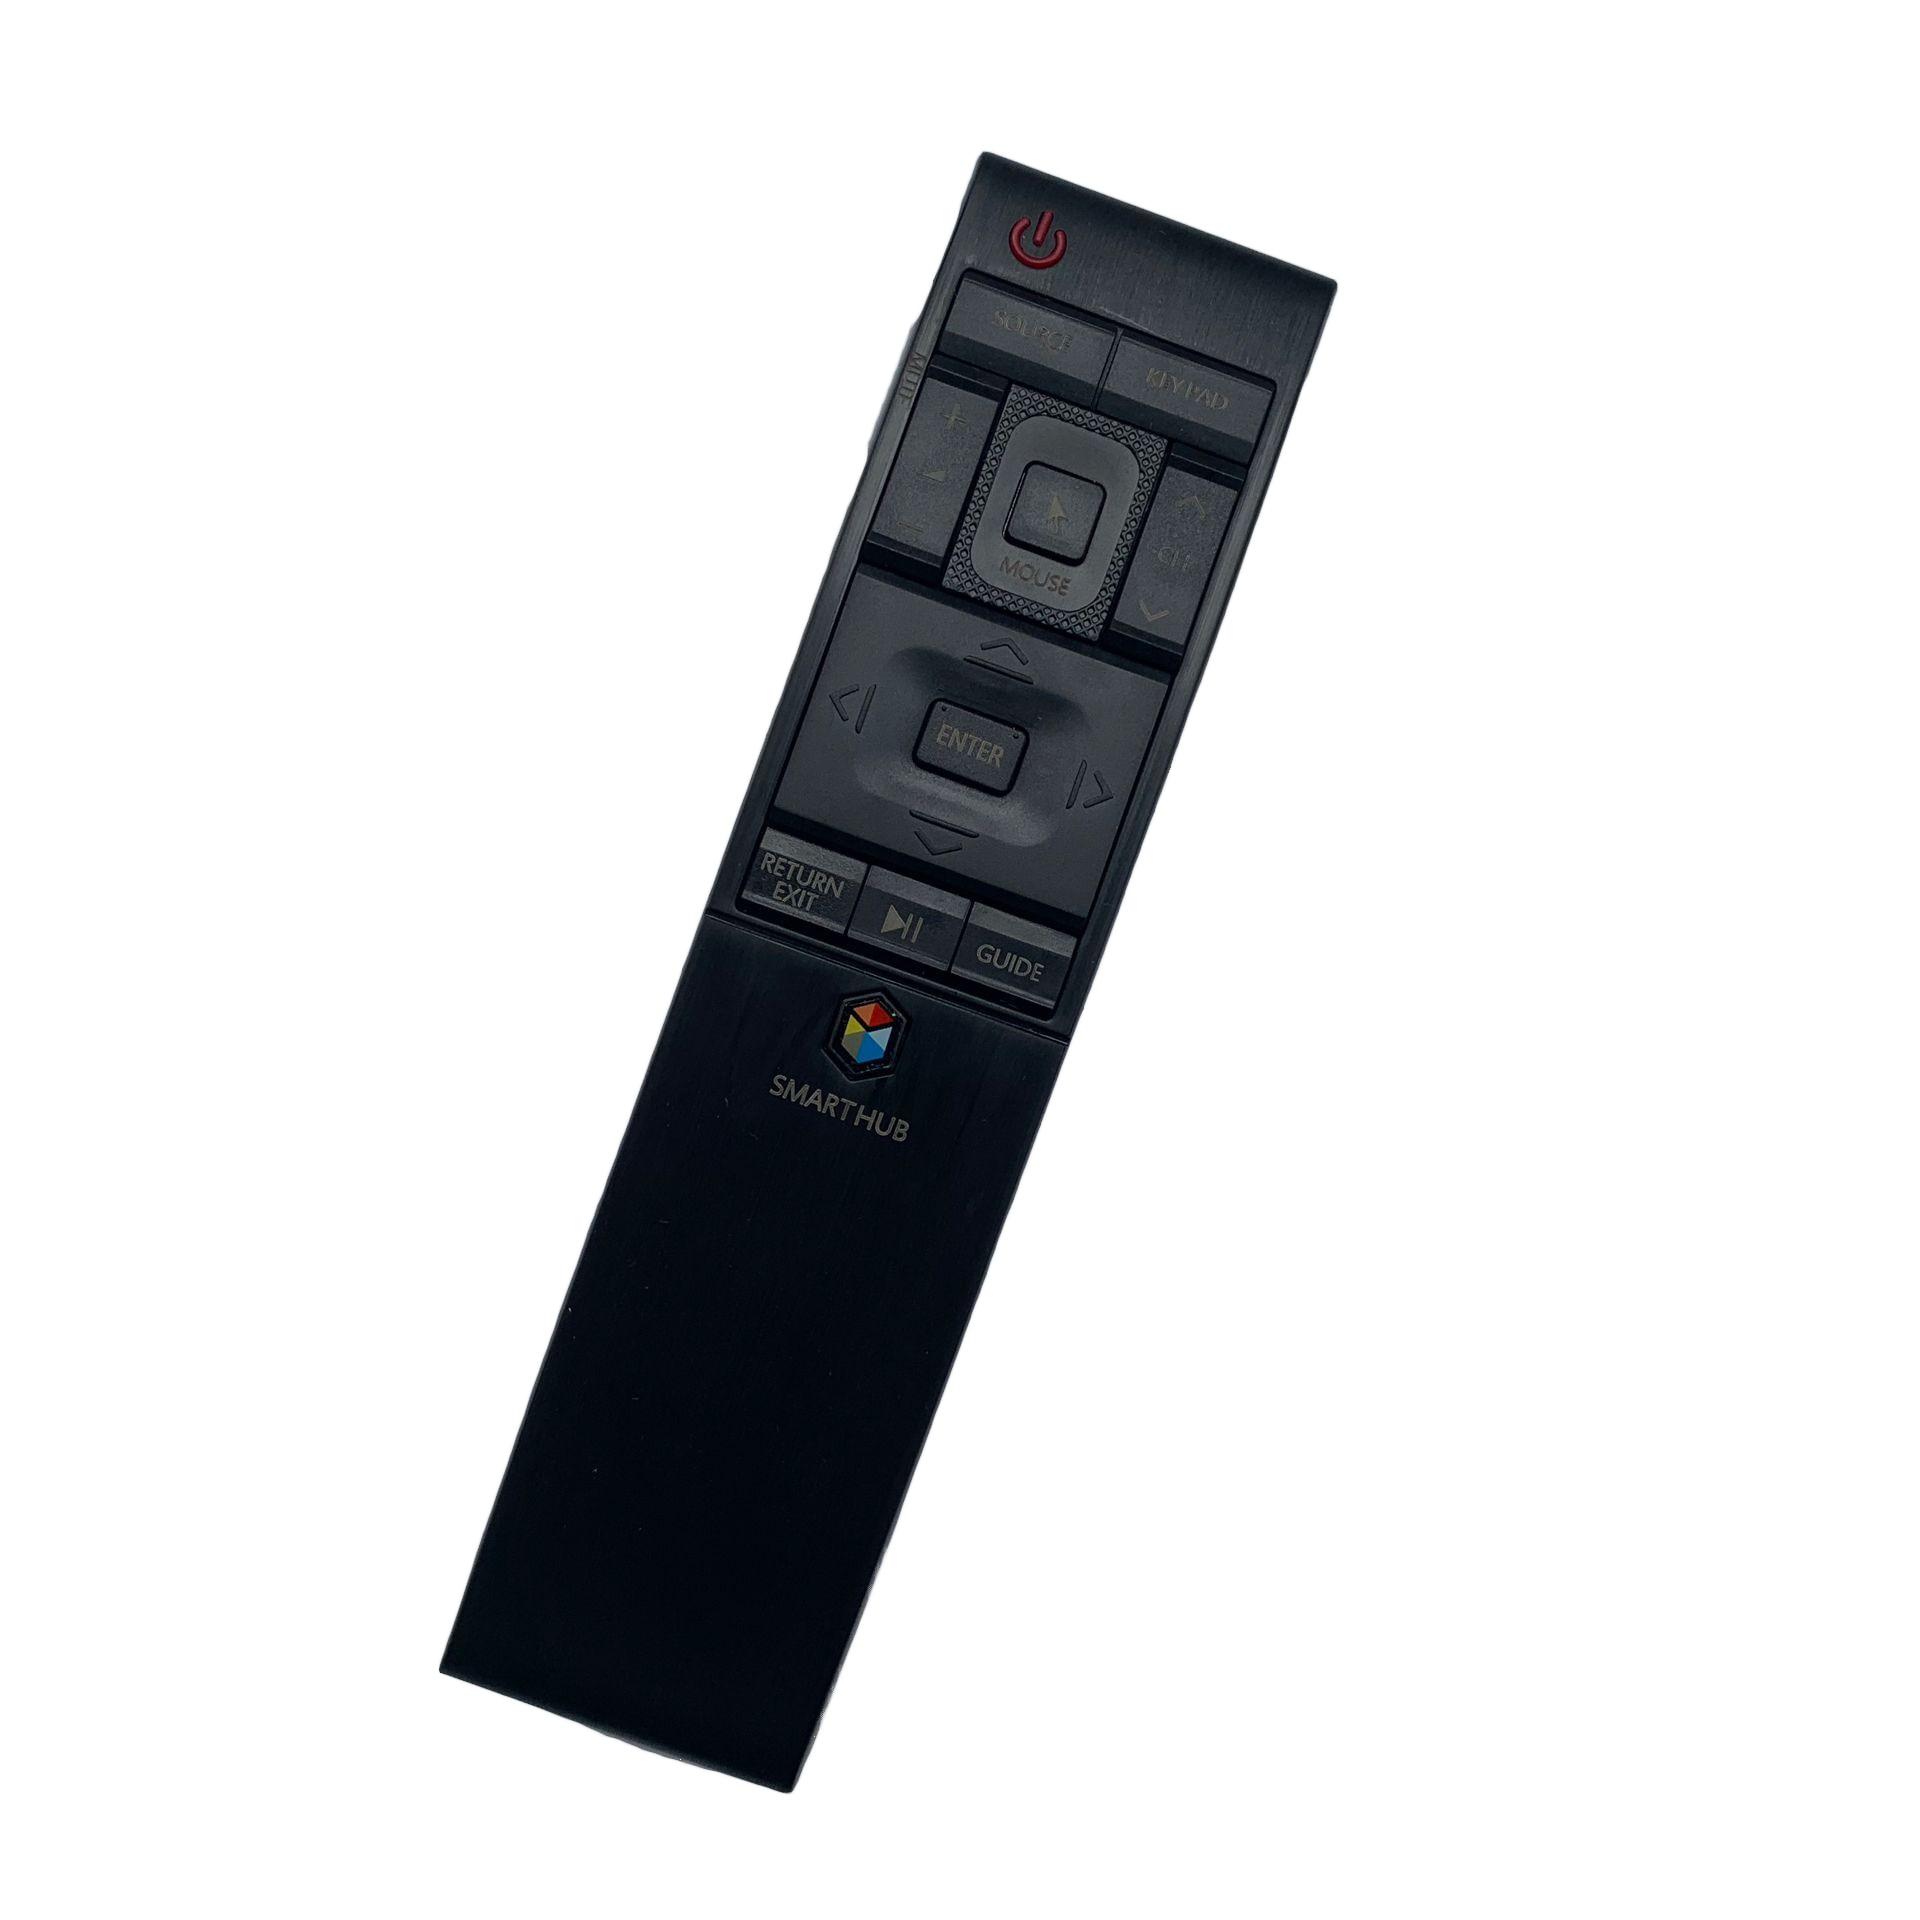 NEW Remote Control Universal For Samsung JU6700, UE32J5500AW, UN48J5500AF/XZA, UN48J5500AFXZA, UN48J550D Smart Hub HDTV TV